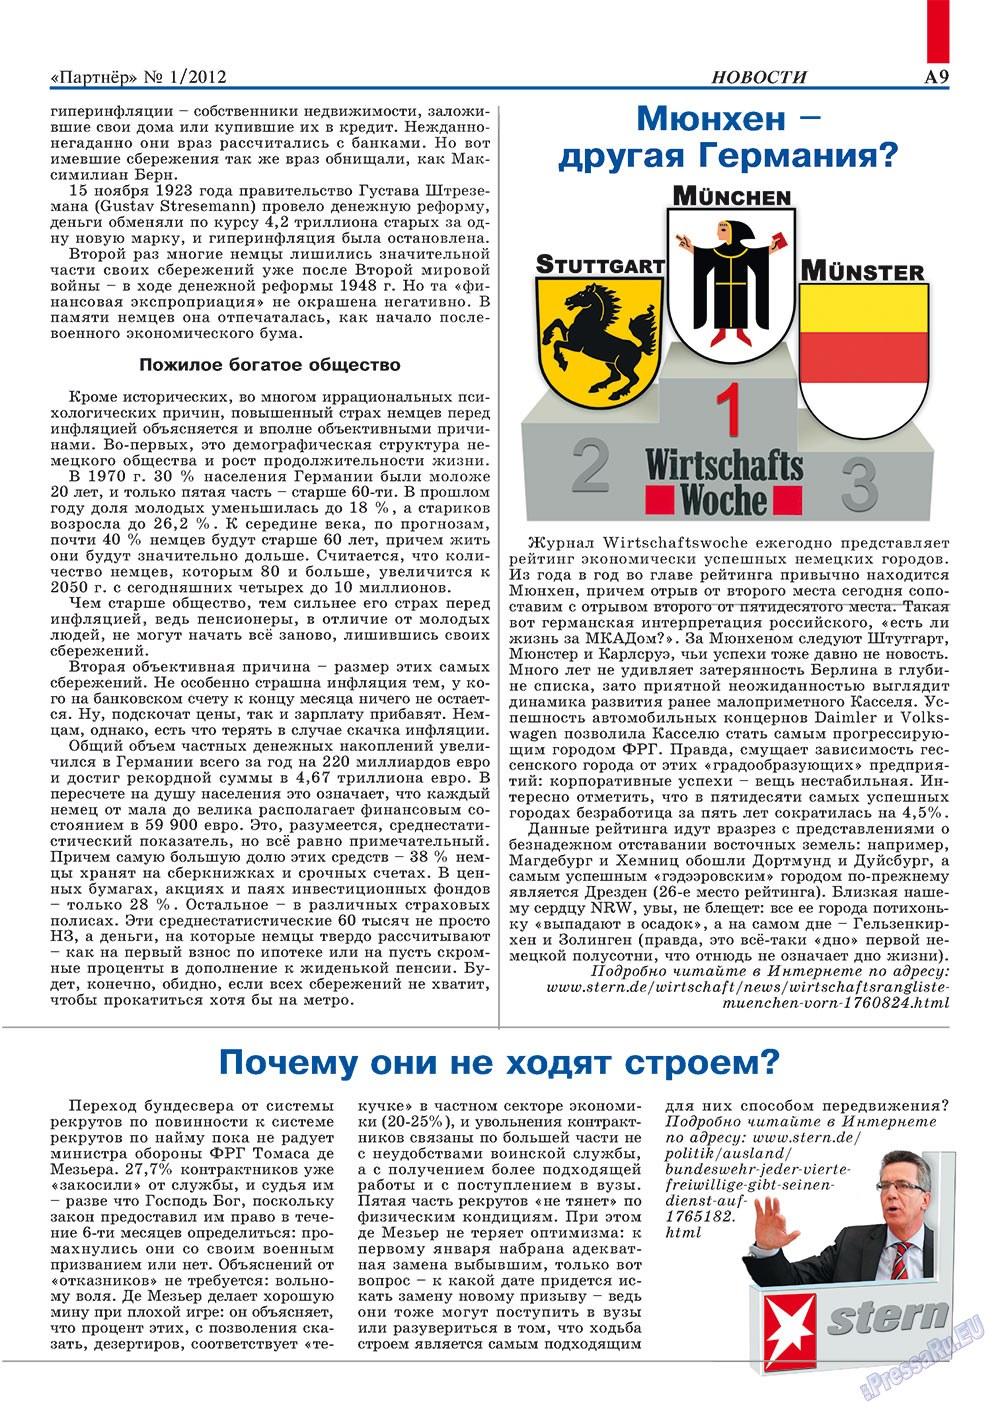 Партнер-север (журнал). 2012 год, номер 1, стр. 9